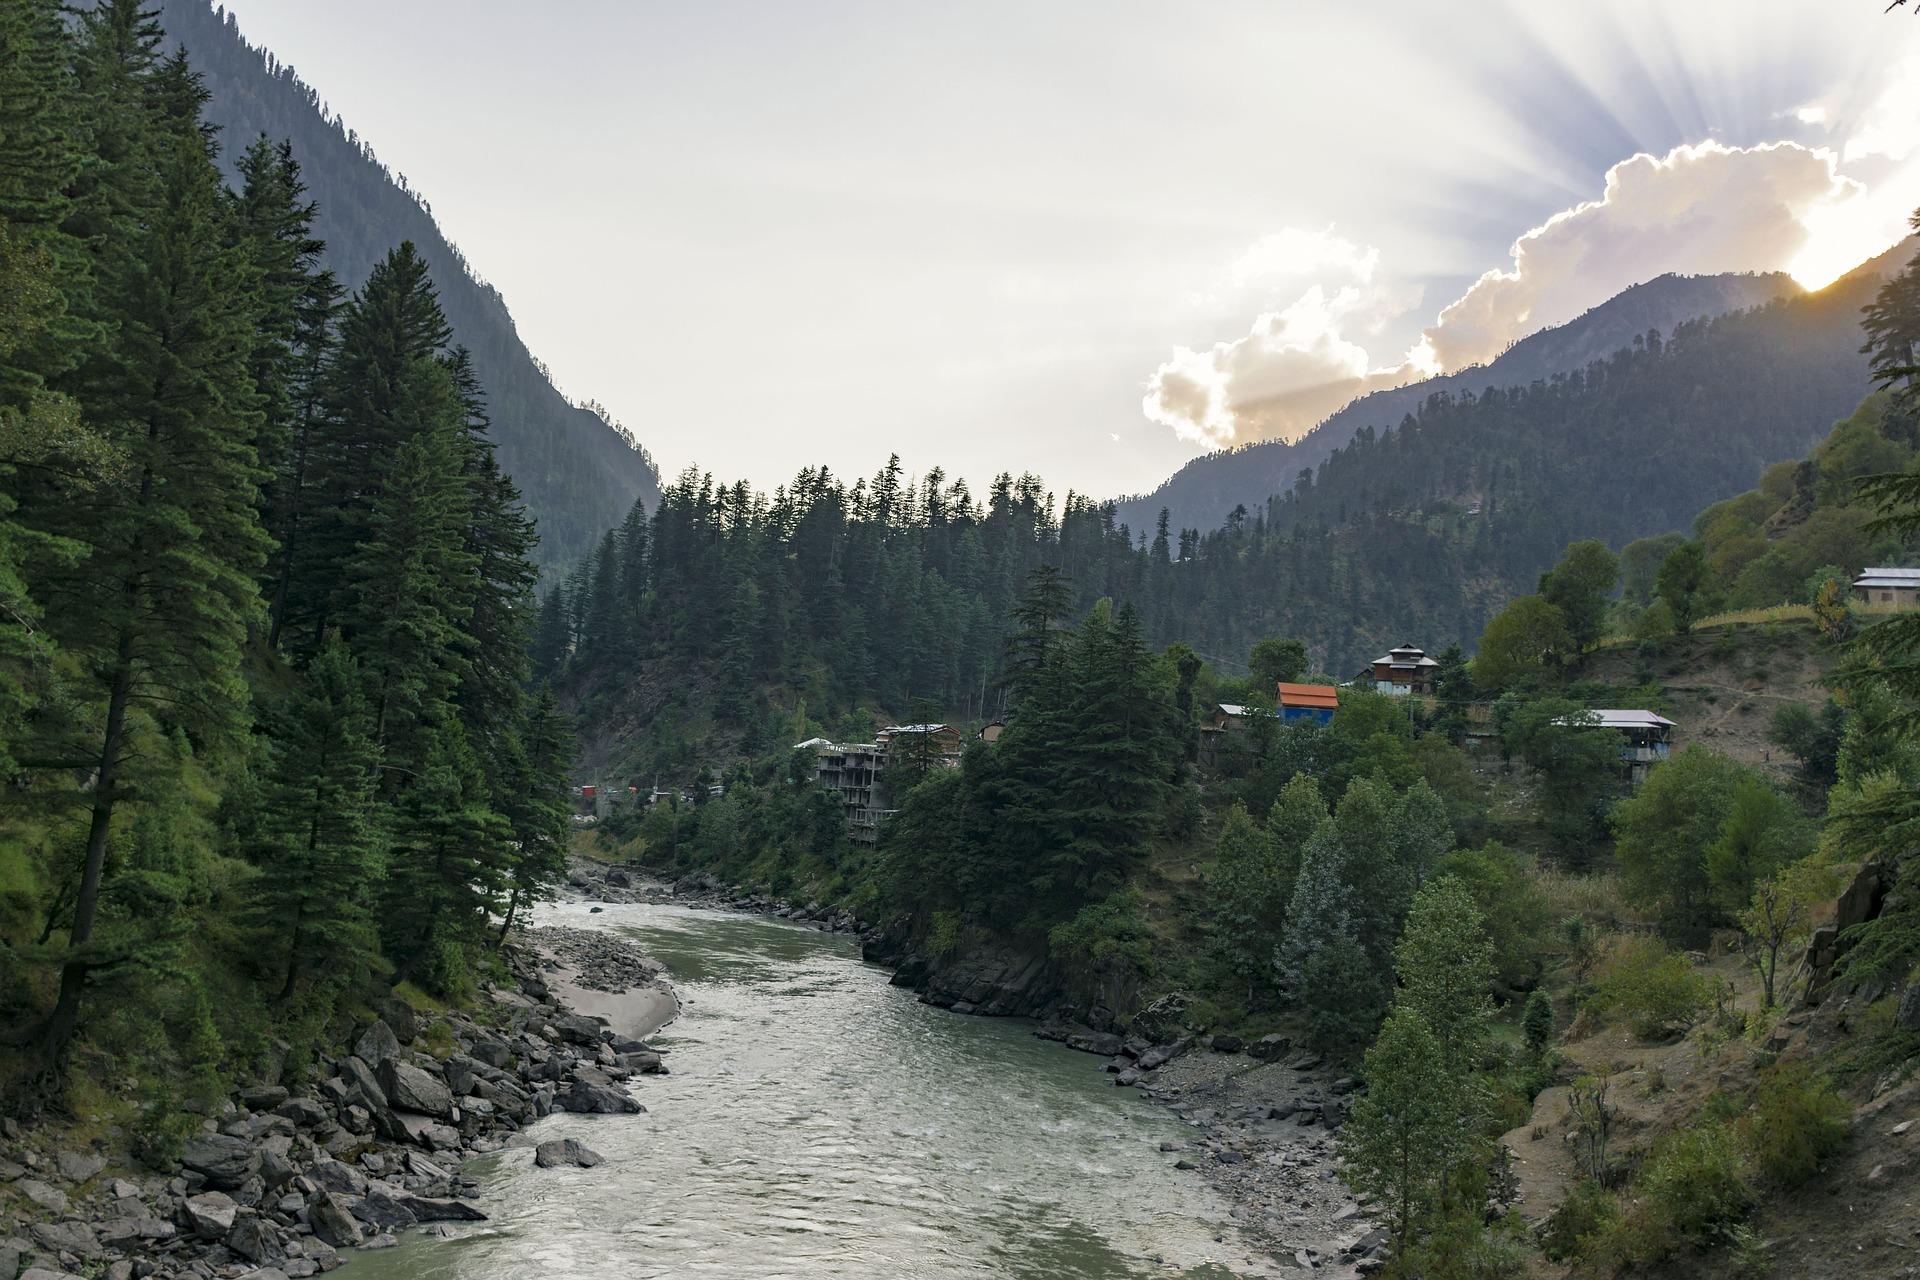 Things to explore in Pakistan - Taoubutt, Neelum Valley, Azaad Kashmir